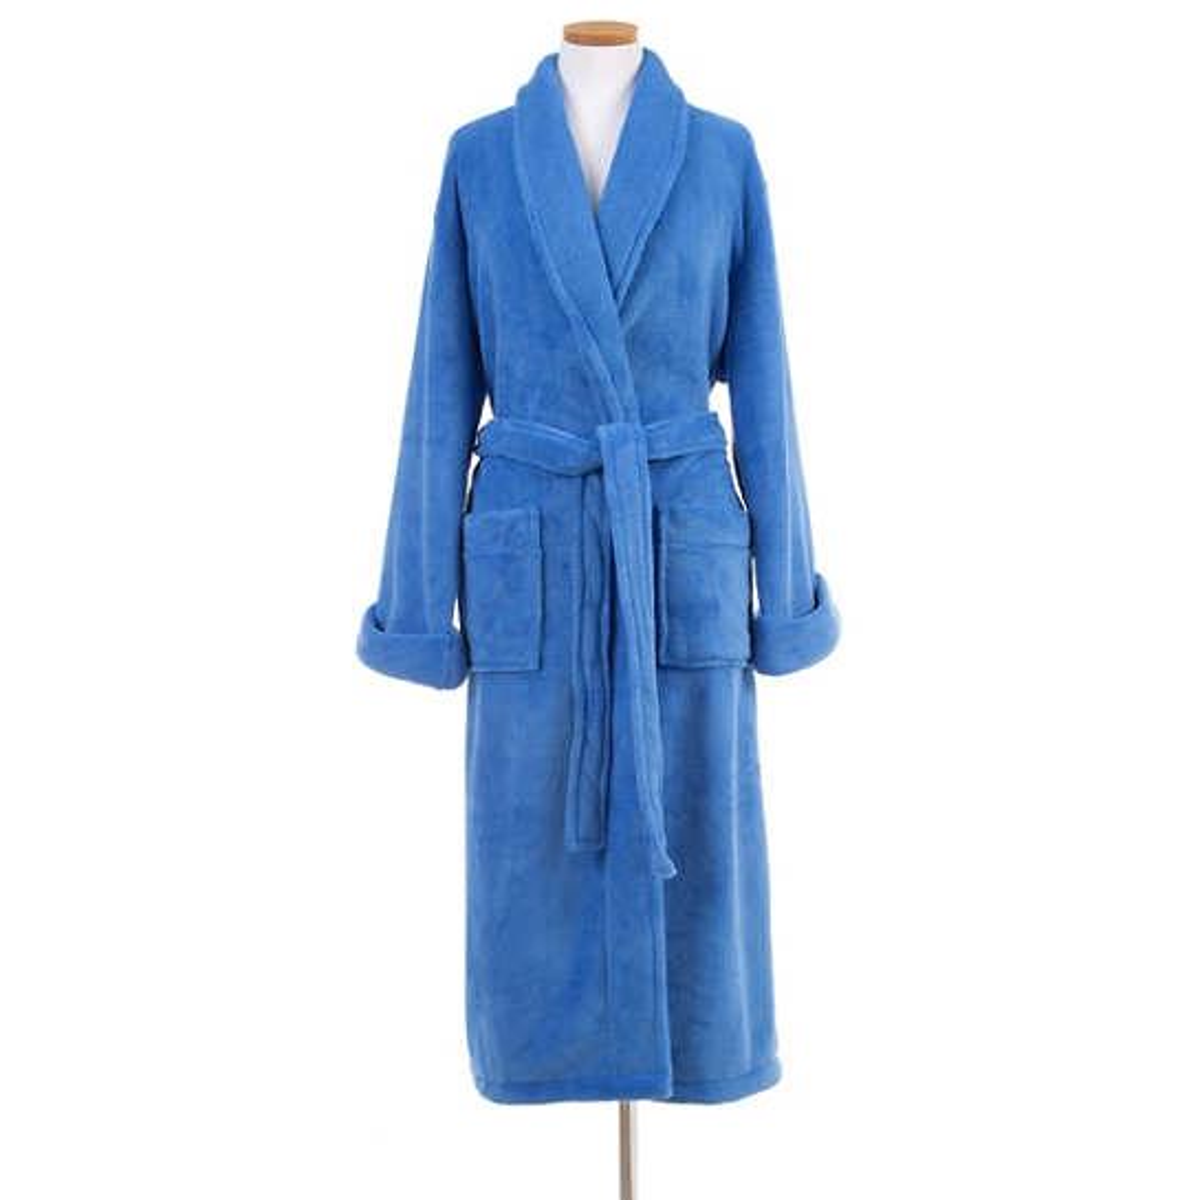 Sheepy Fleece French Blue Robe